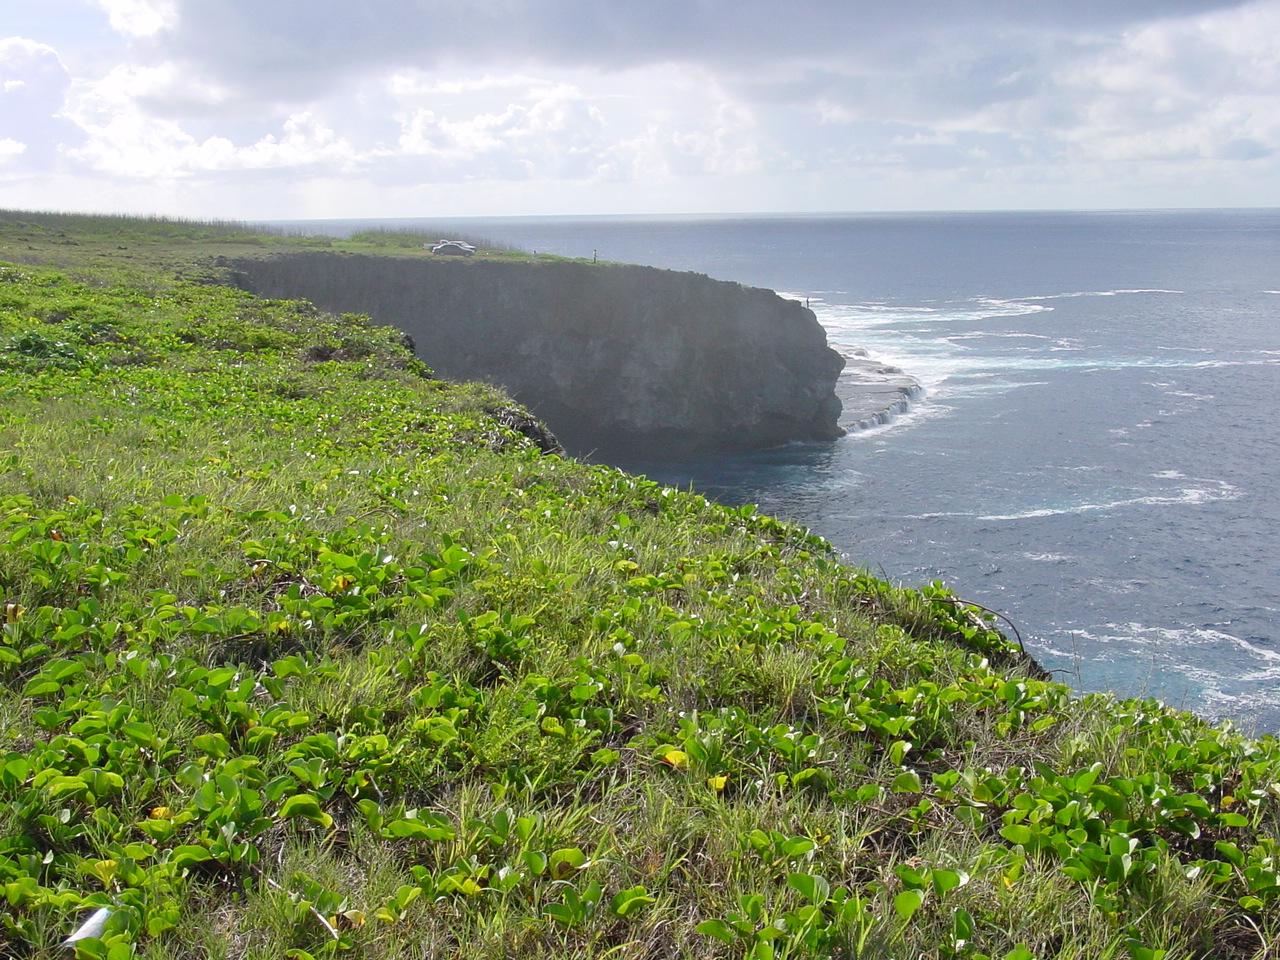 Cliff views, Saipan, Northern Mariana Islands